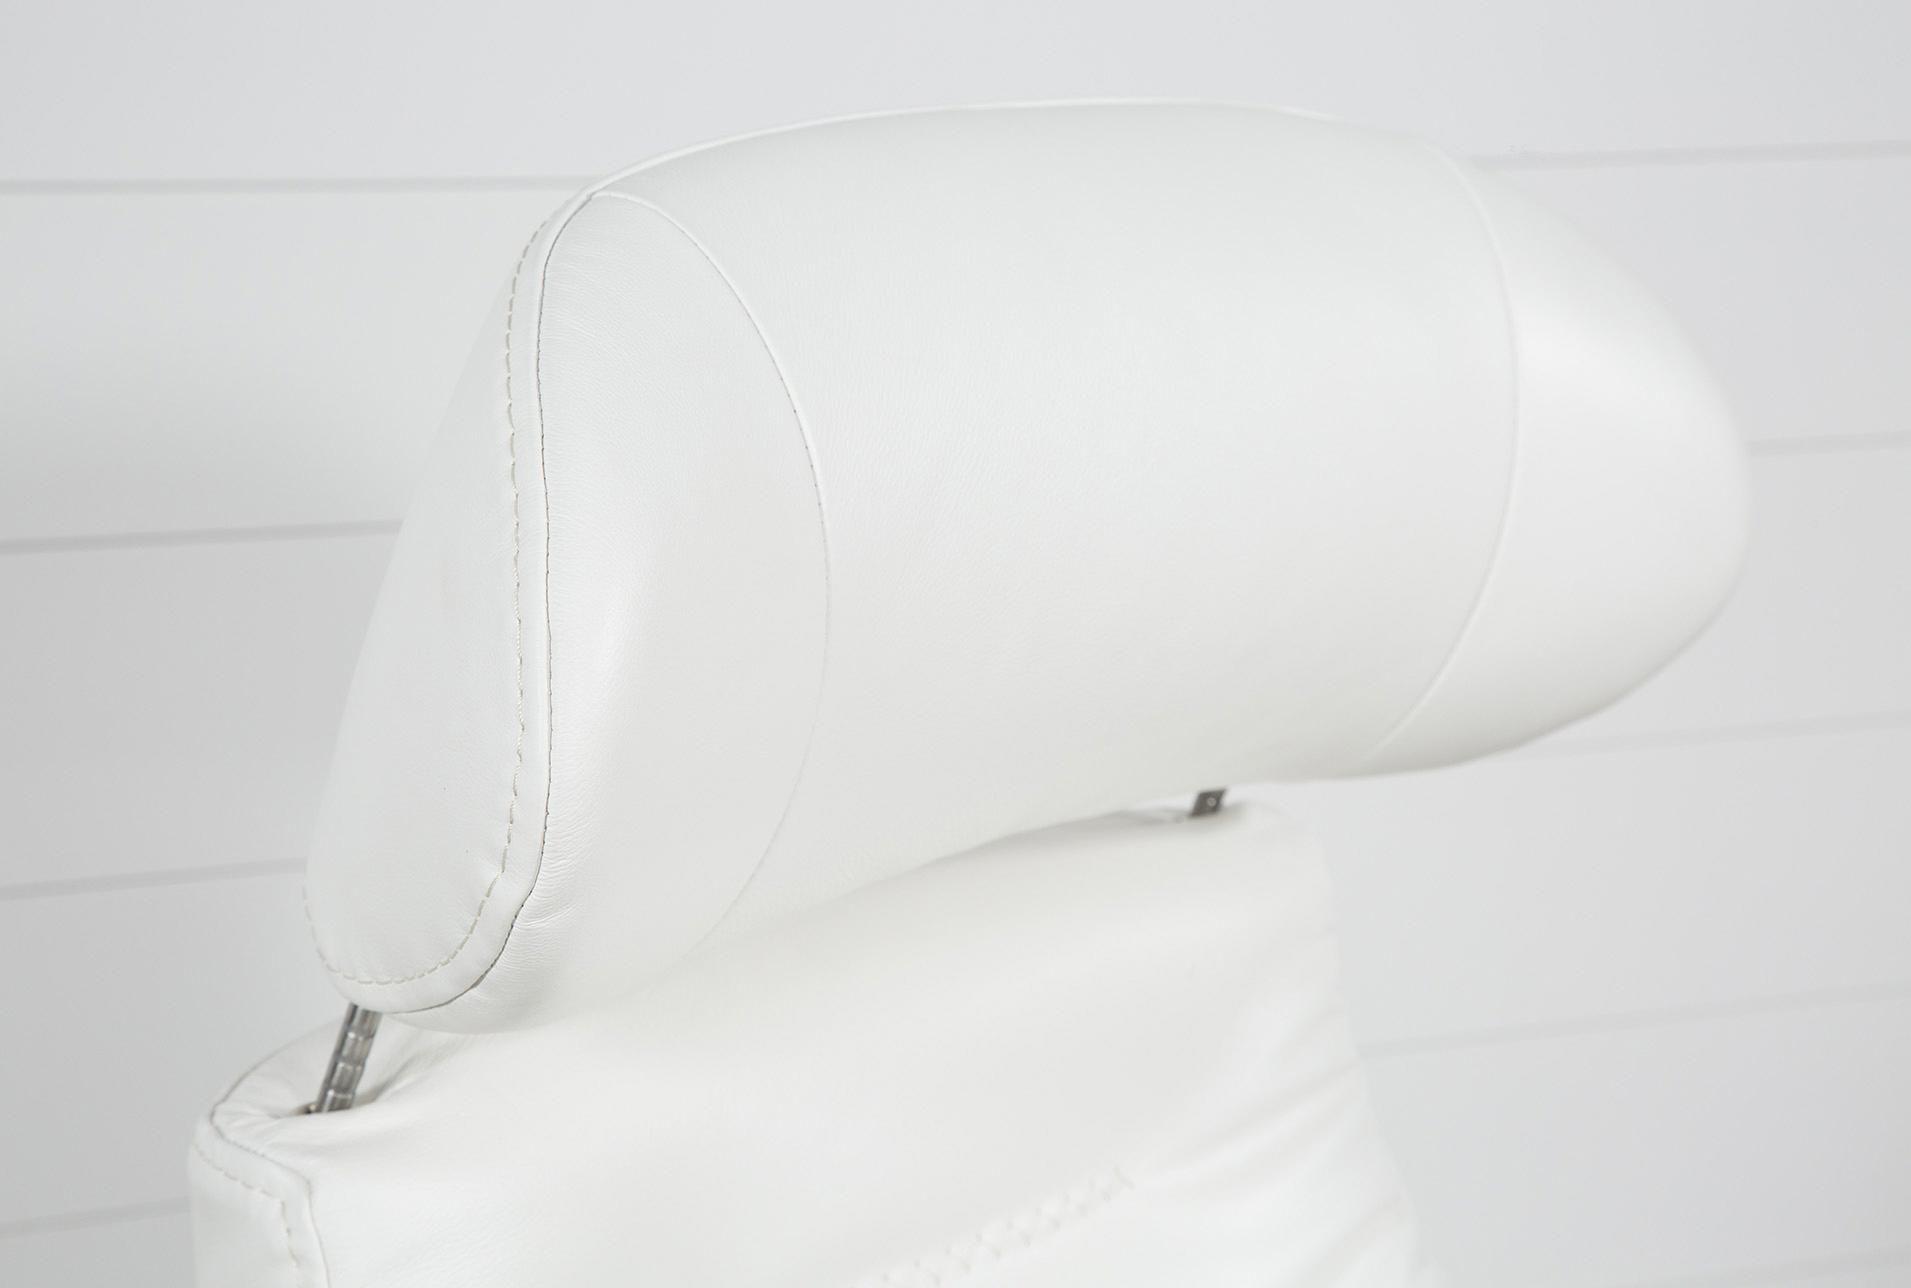 Amala White Leather Reclining Swivel Chair #whiteleatherchair With Regard To Amala White Leather Reclining Swivel Chairs (View 4 of 25)